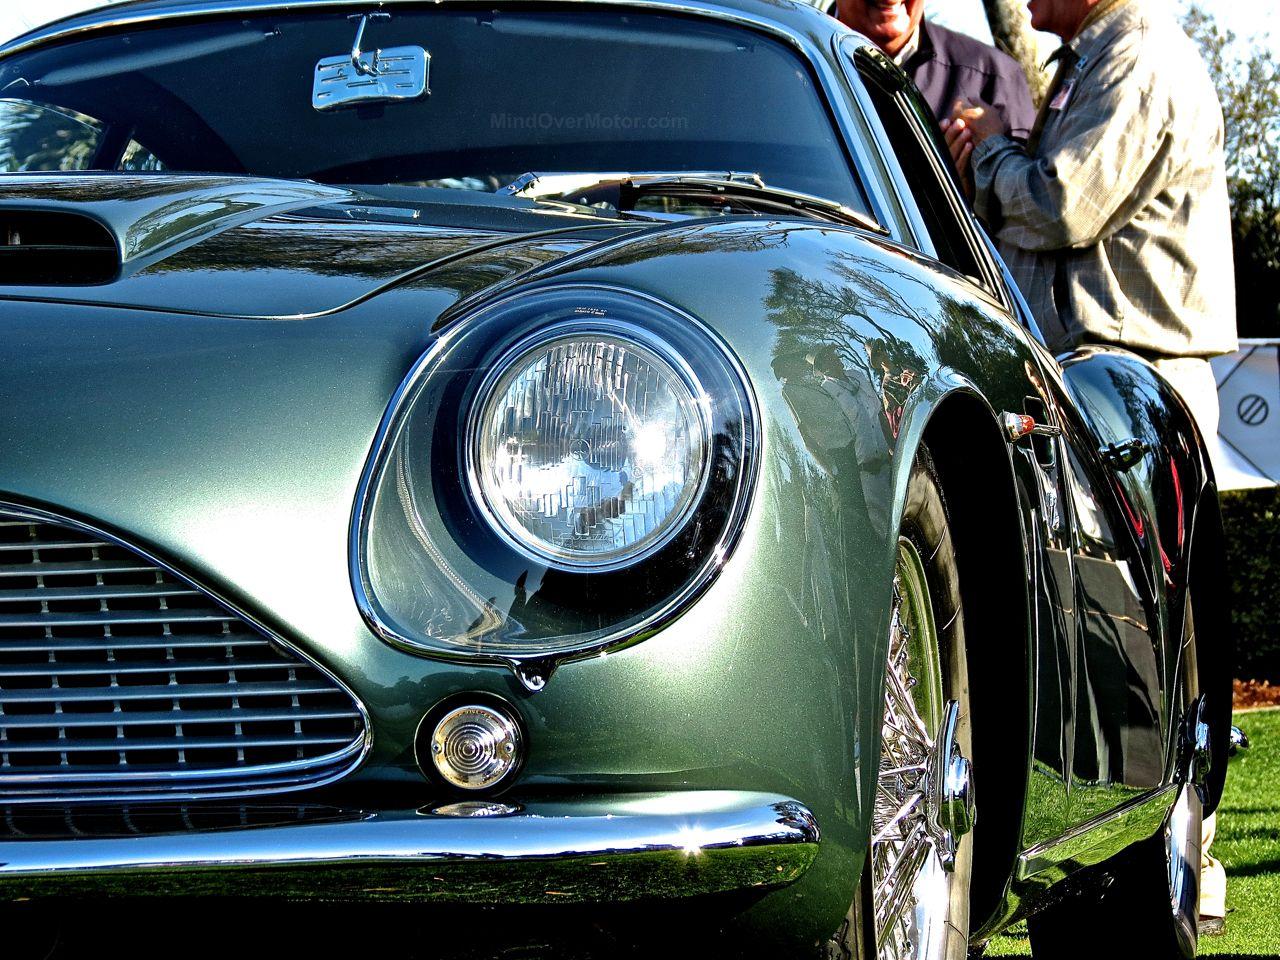 Aston Martin DB4 GT Zagato Amelia Island 4